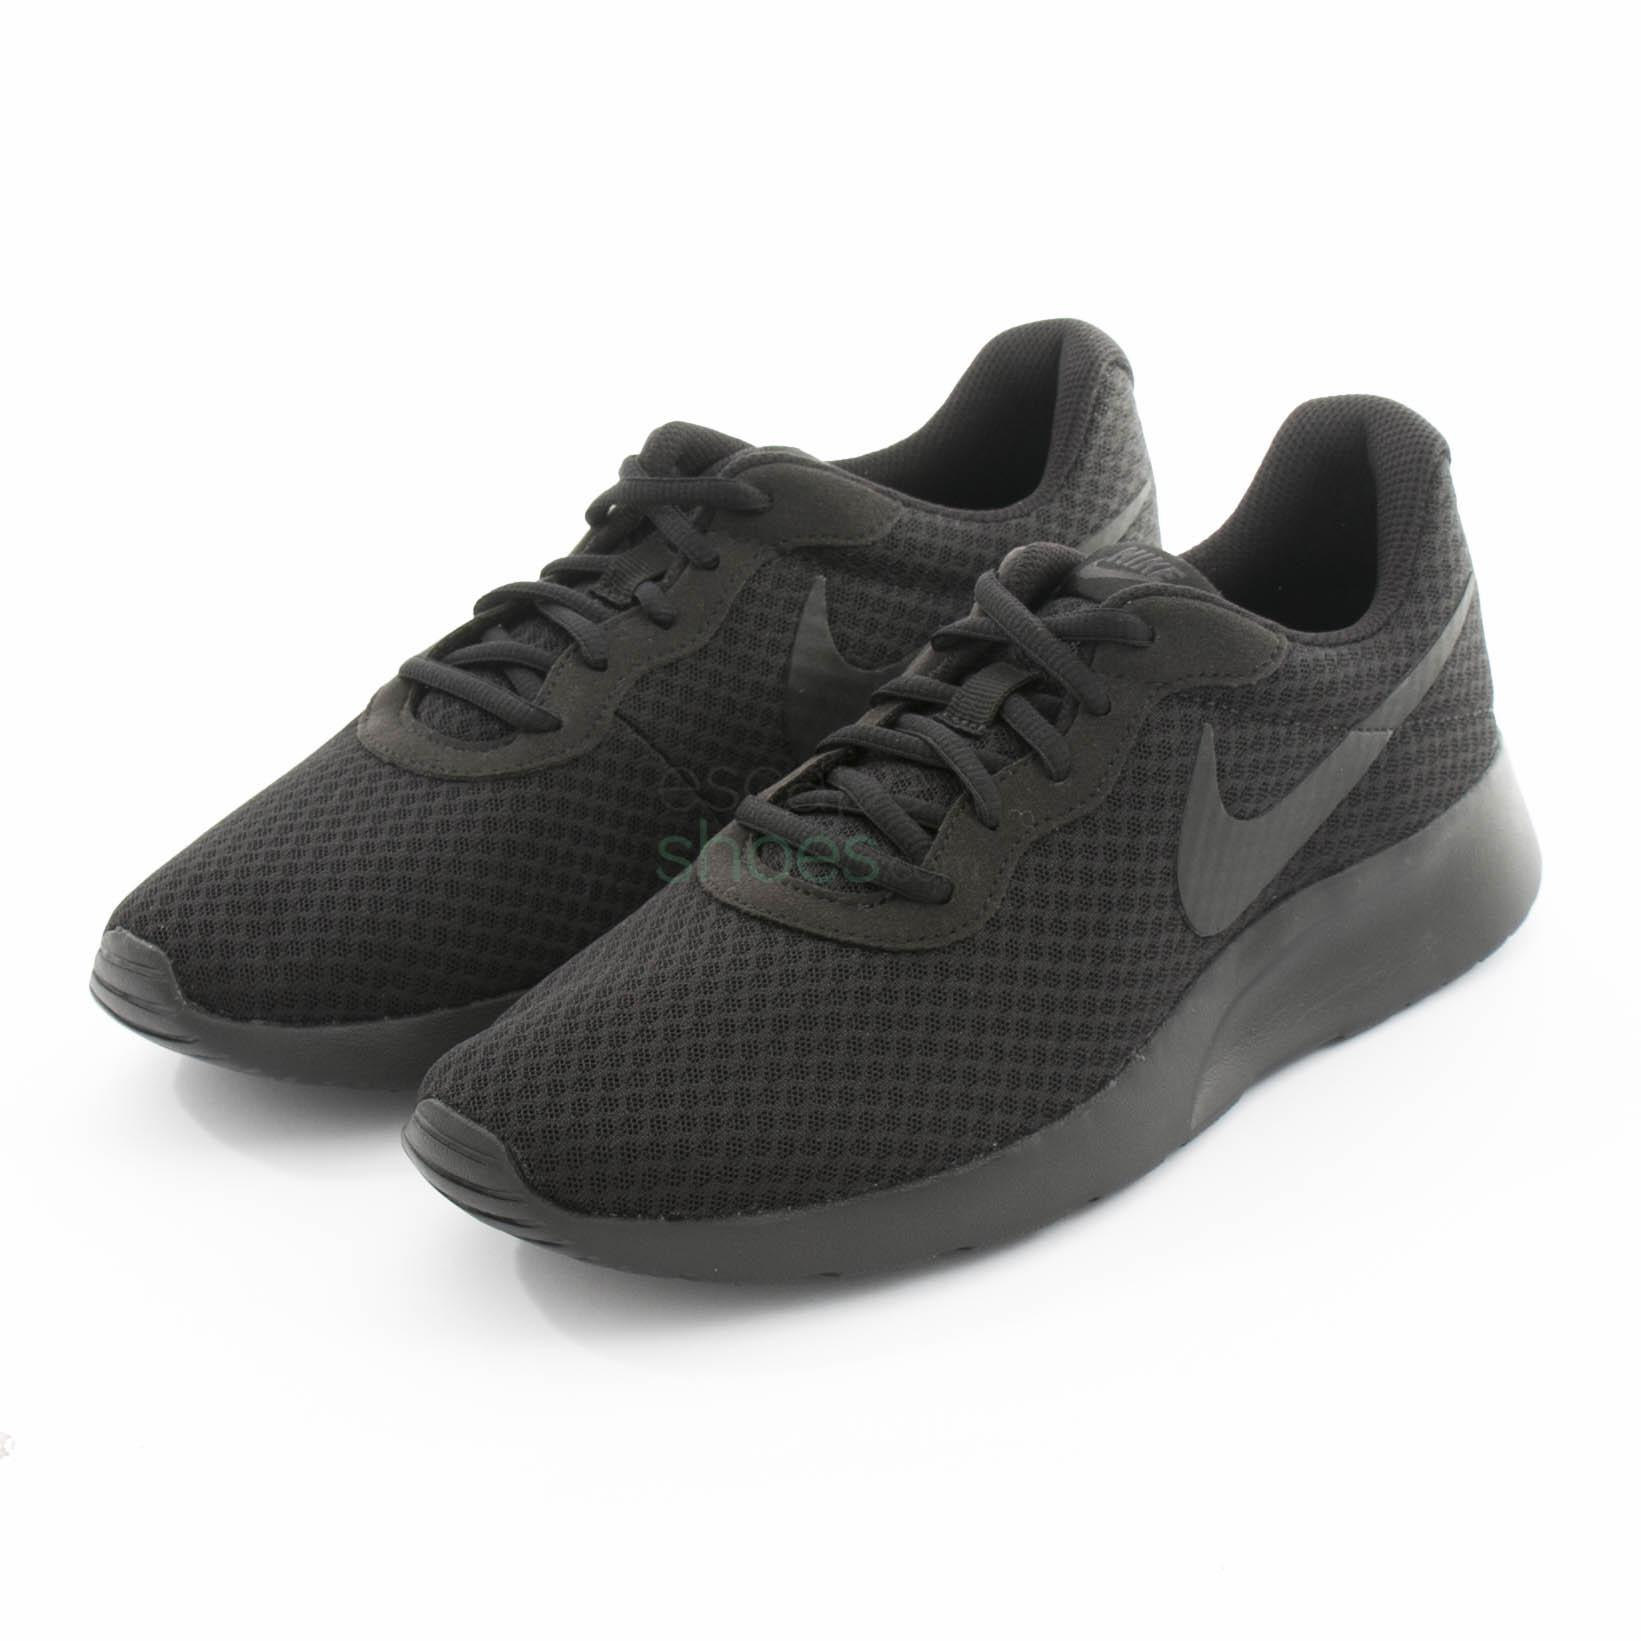 03ba914cee Buy your Sneakers NIKE Tanjun Black Anthracite 812654 001 here ...